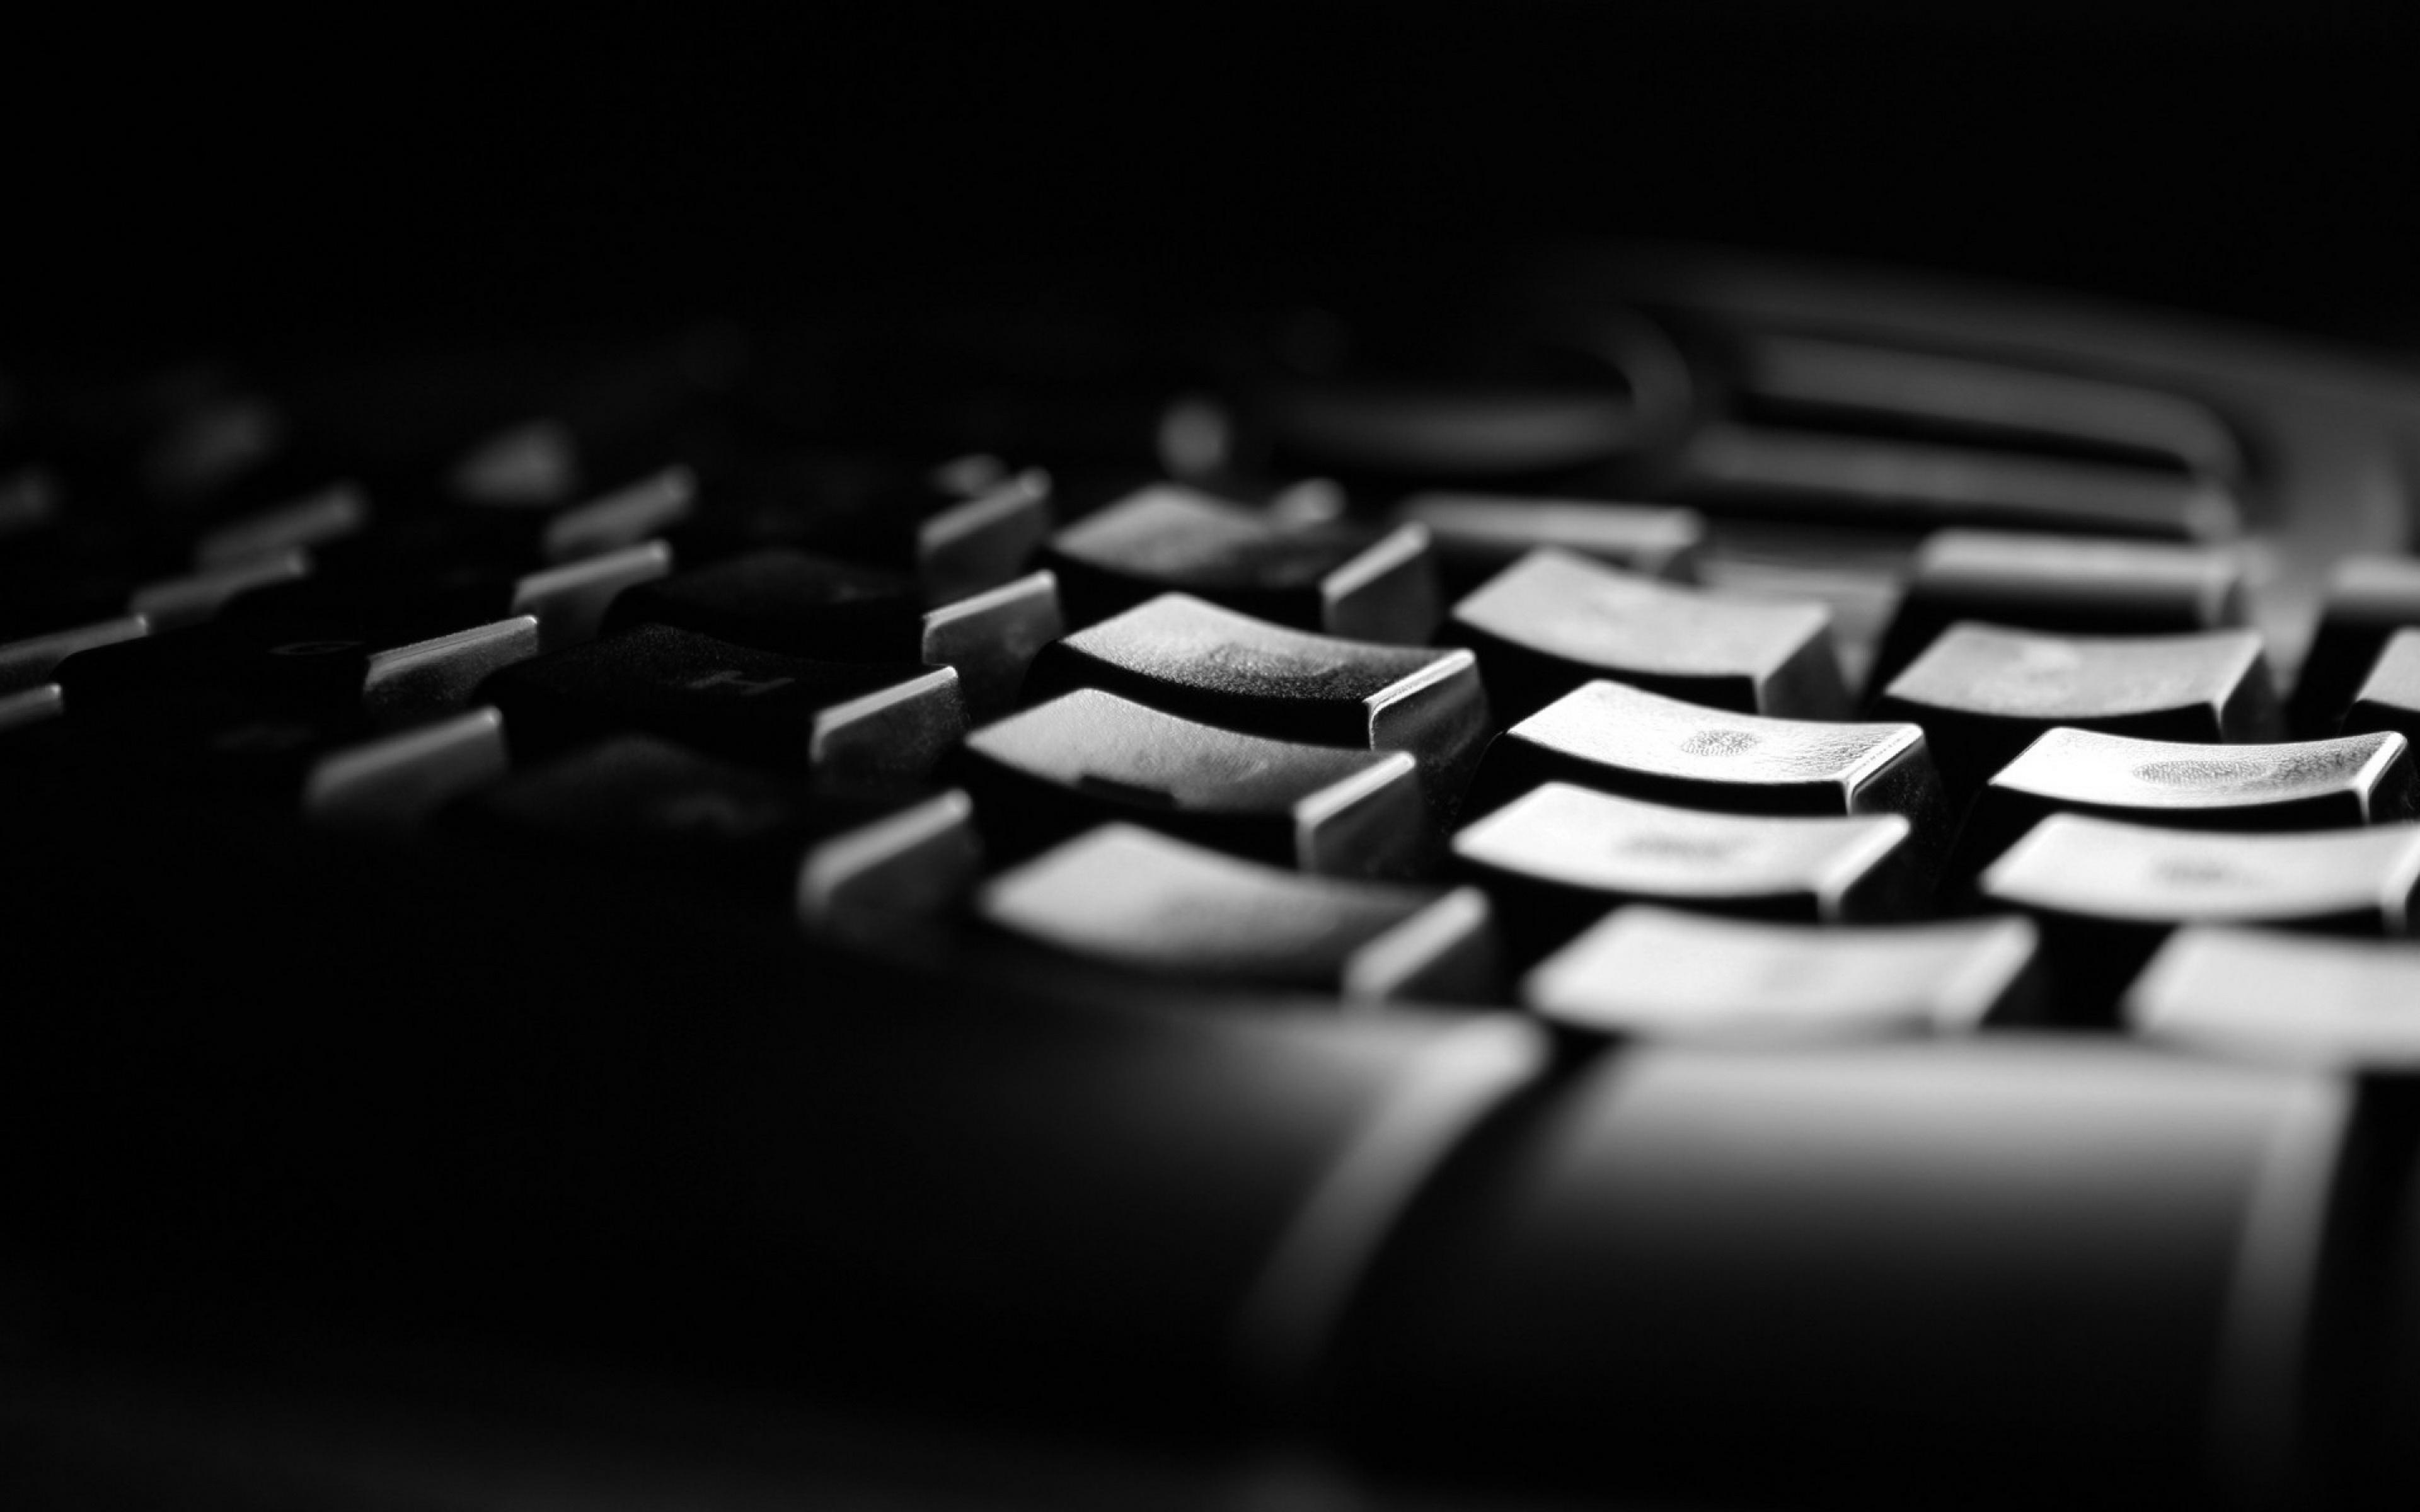 keyboard widescreen wallpaper 50584